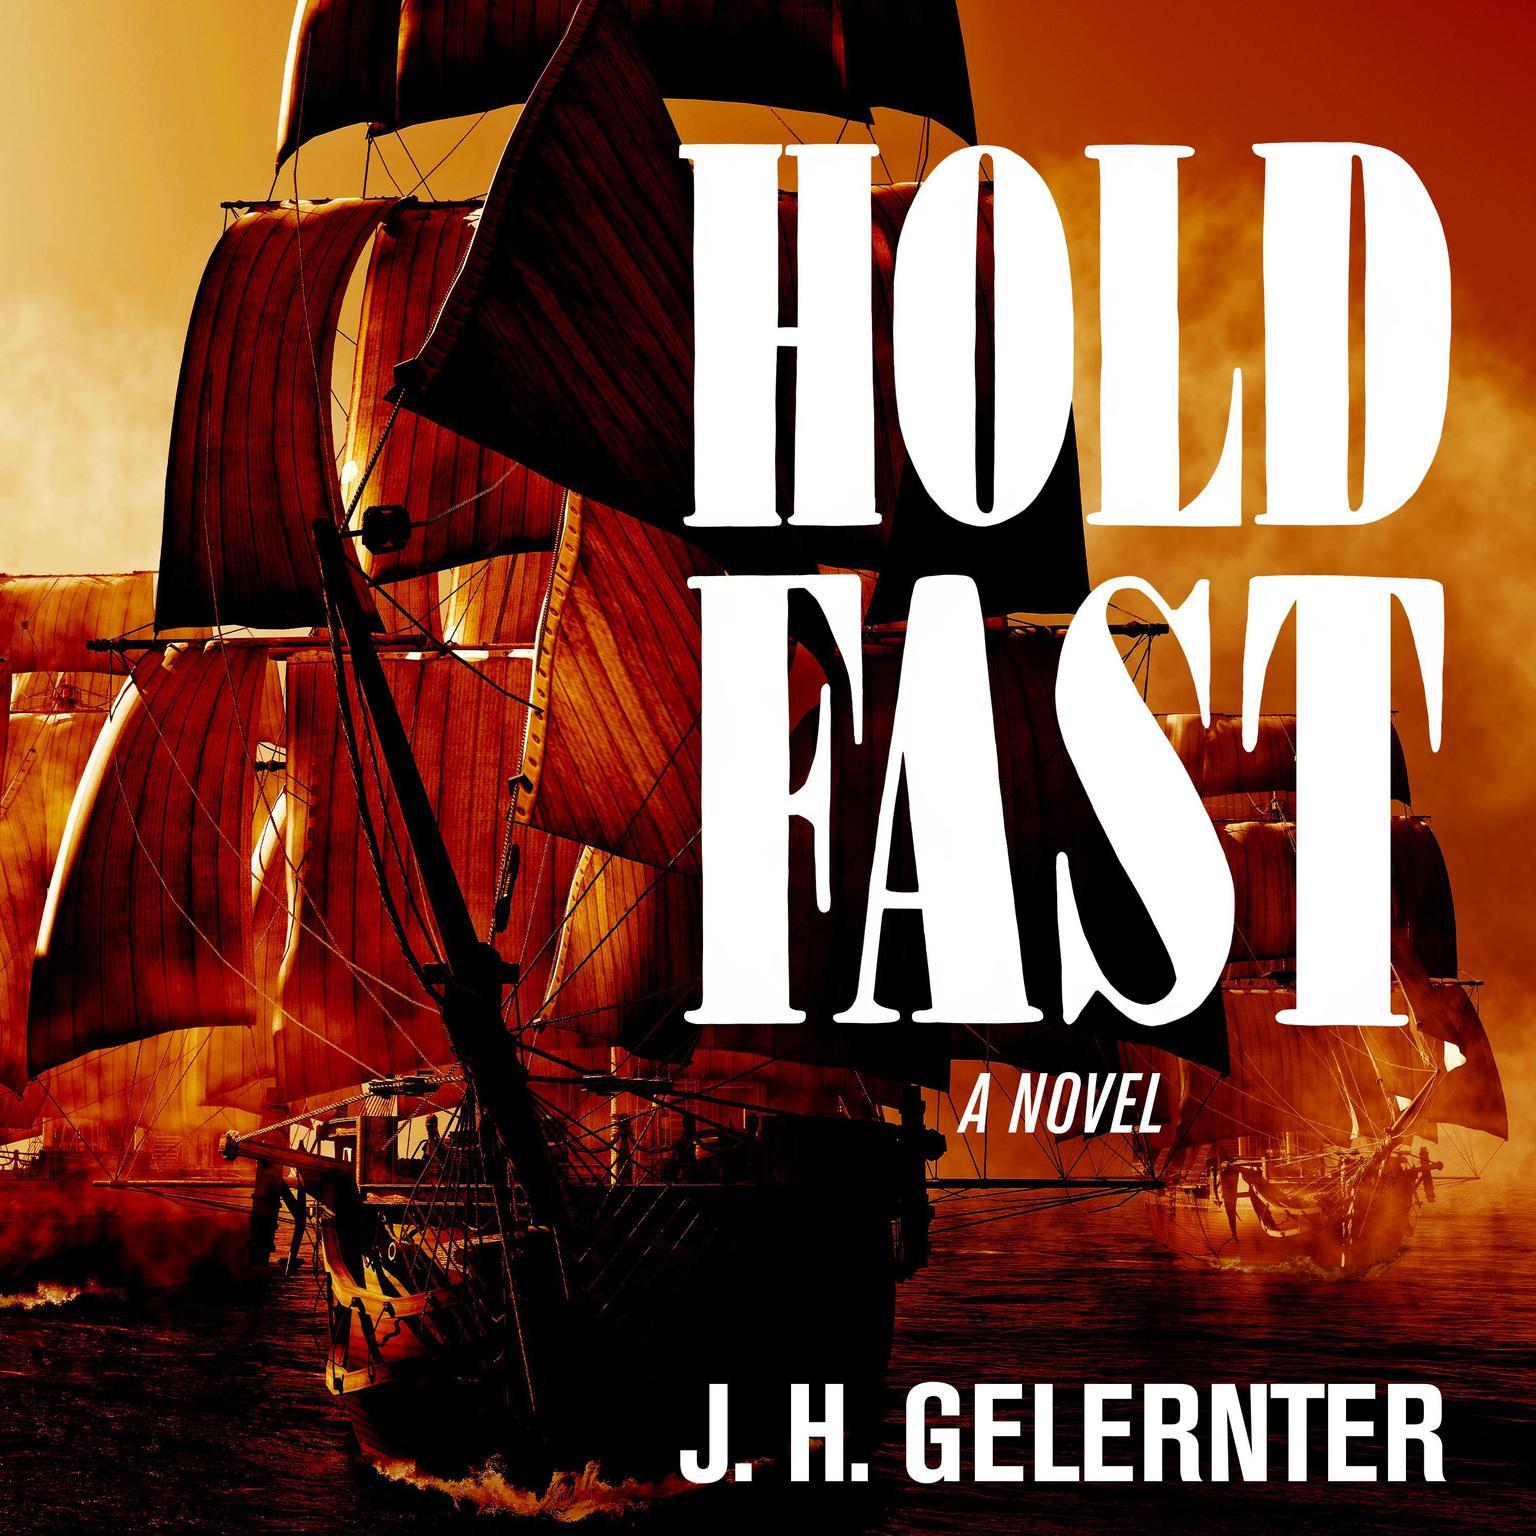 Hold Fast: A Novel Audiobook, by J. H. Gelernter